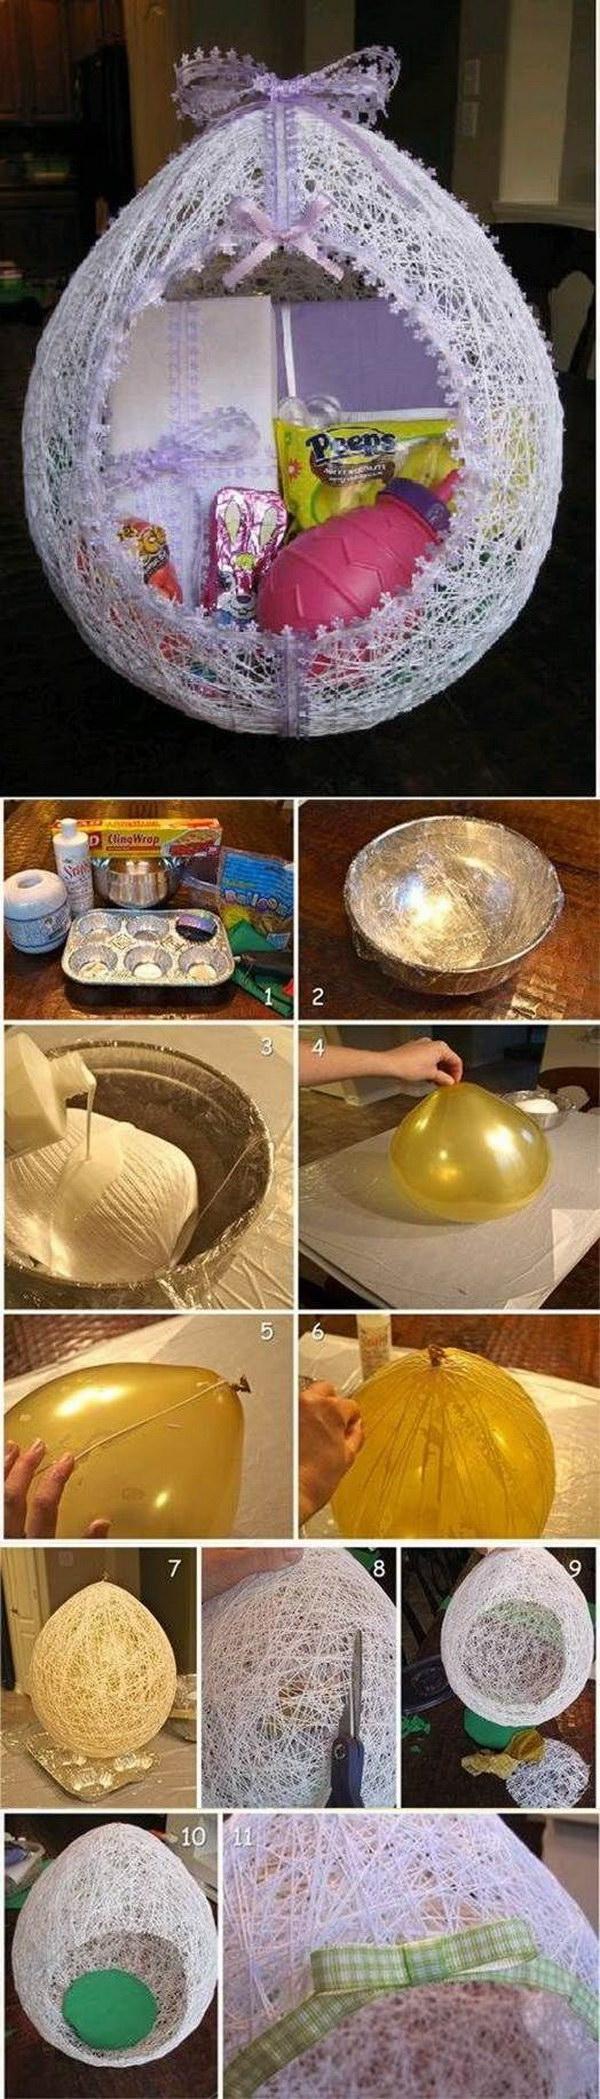 6 Egg Shaped Easter Basket From String